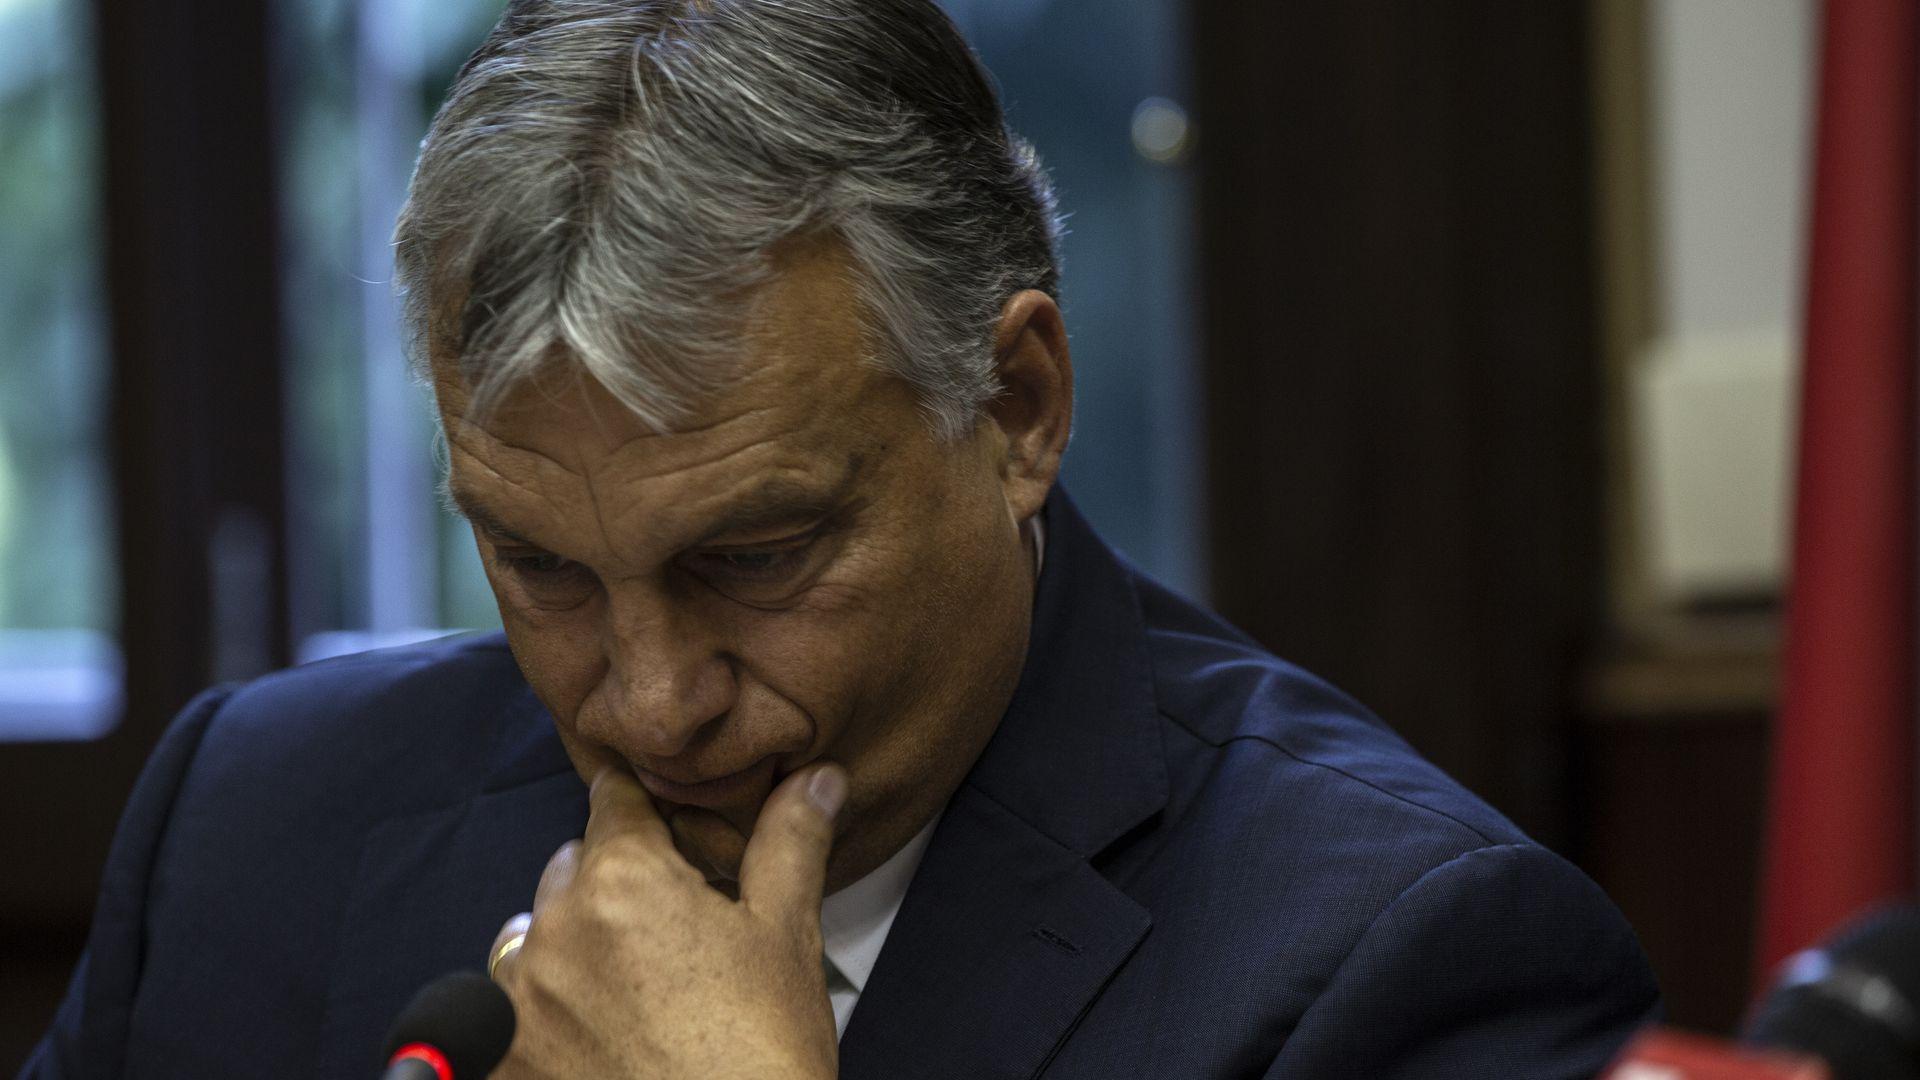 Hungary Prime Minister Viktor Orban